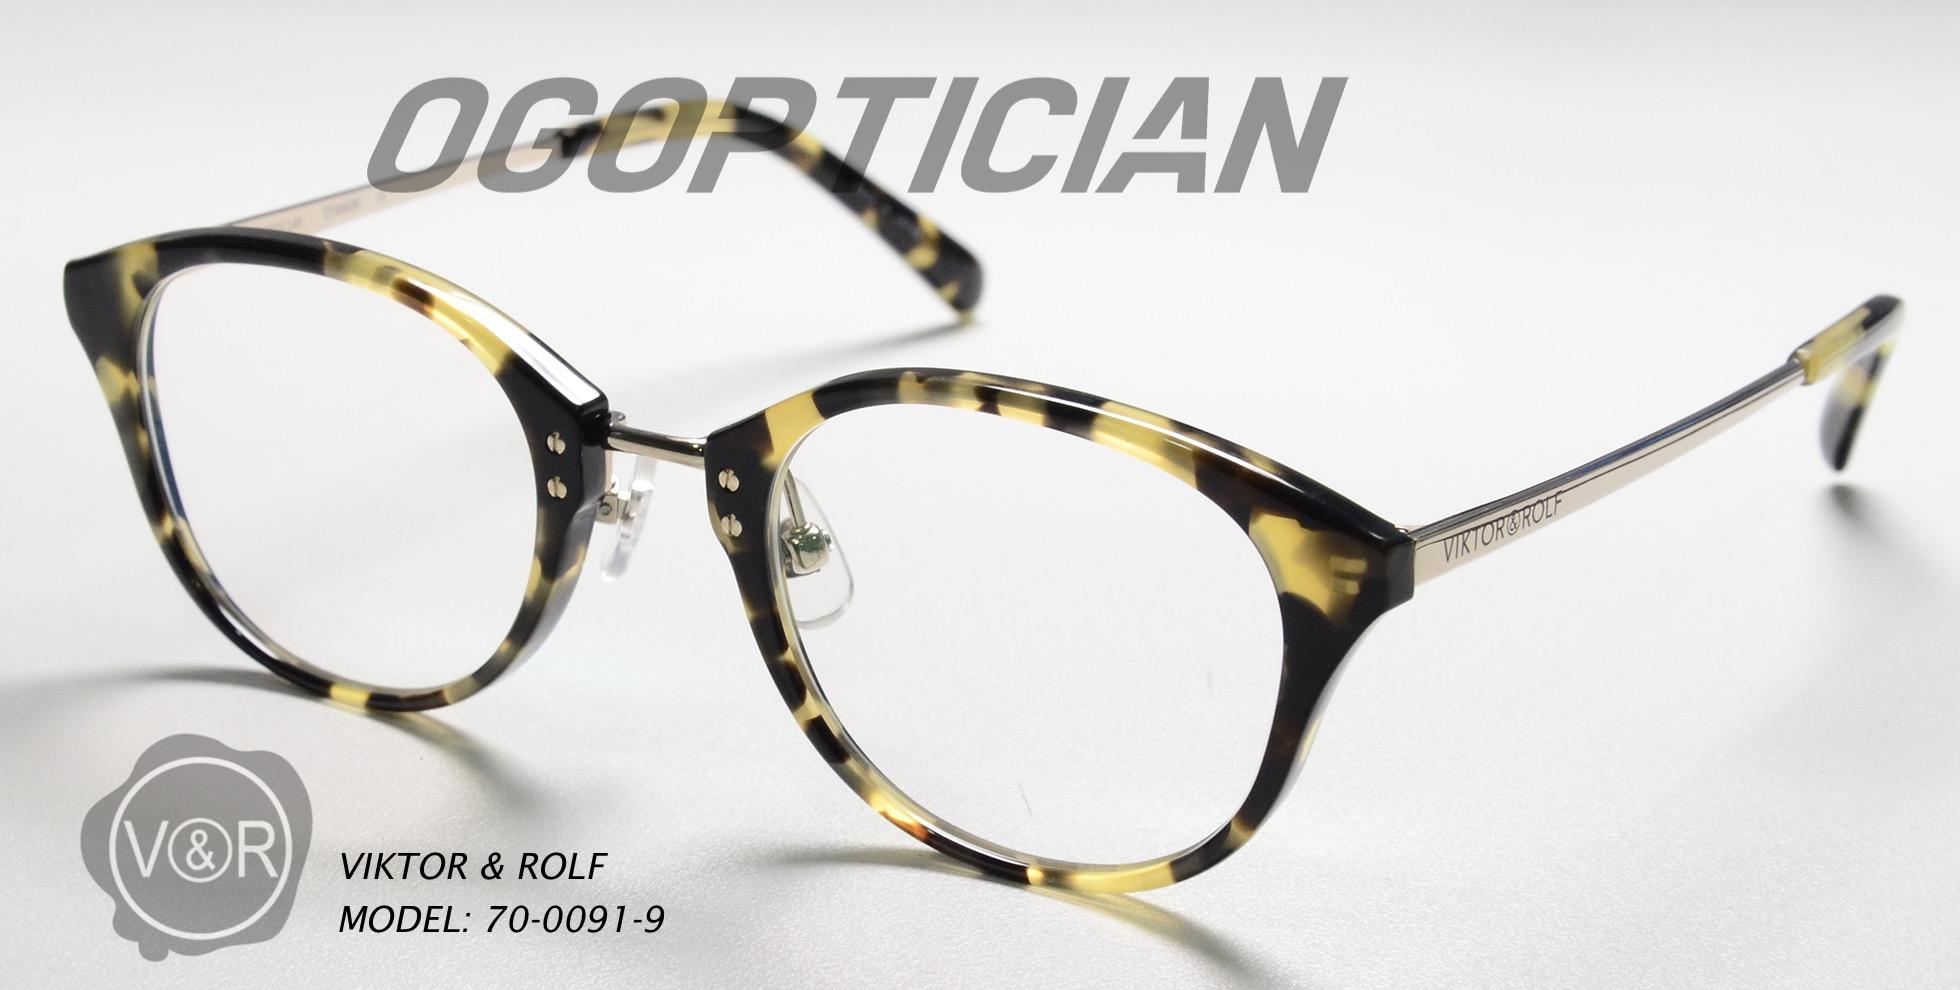 VIKTORANDROLF 70-0091-9